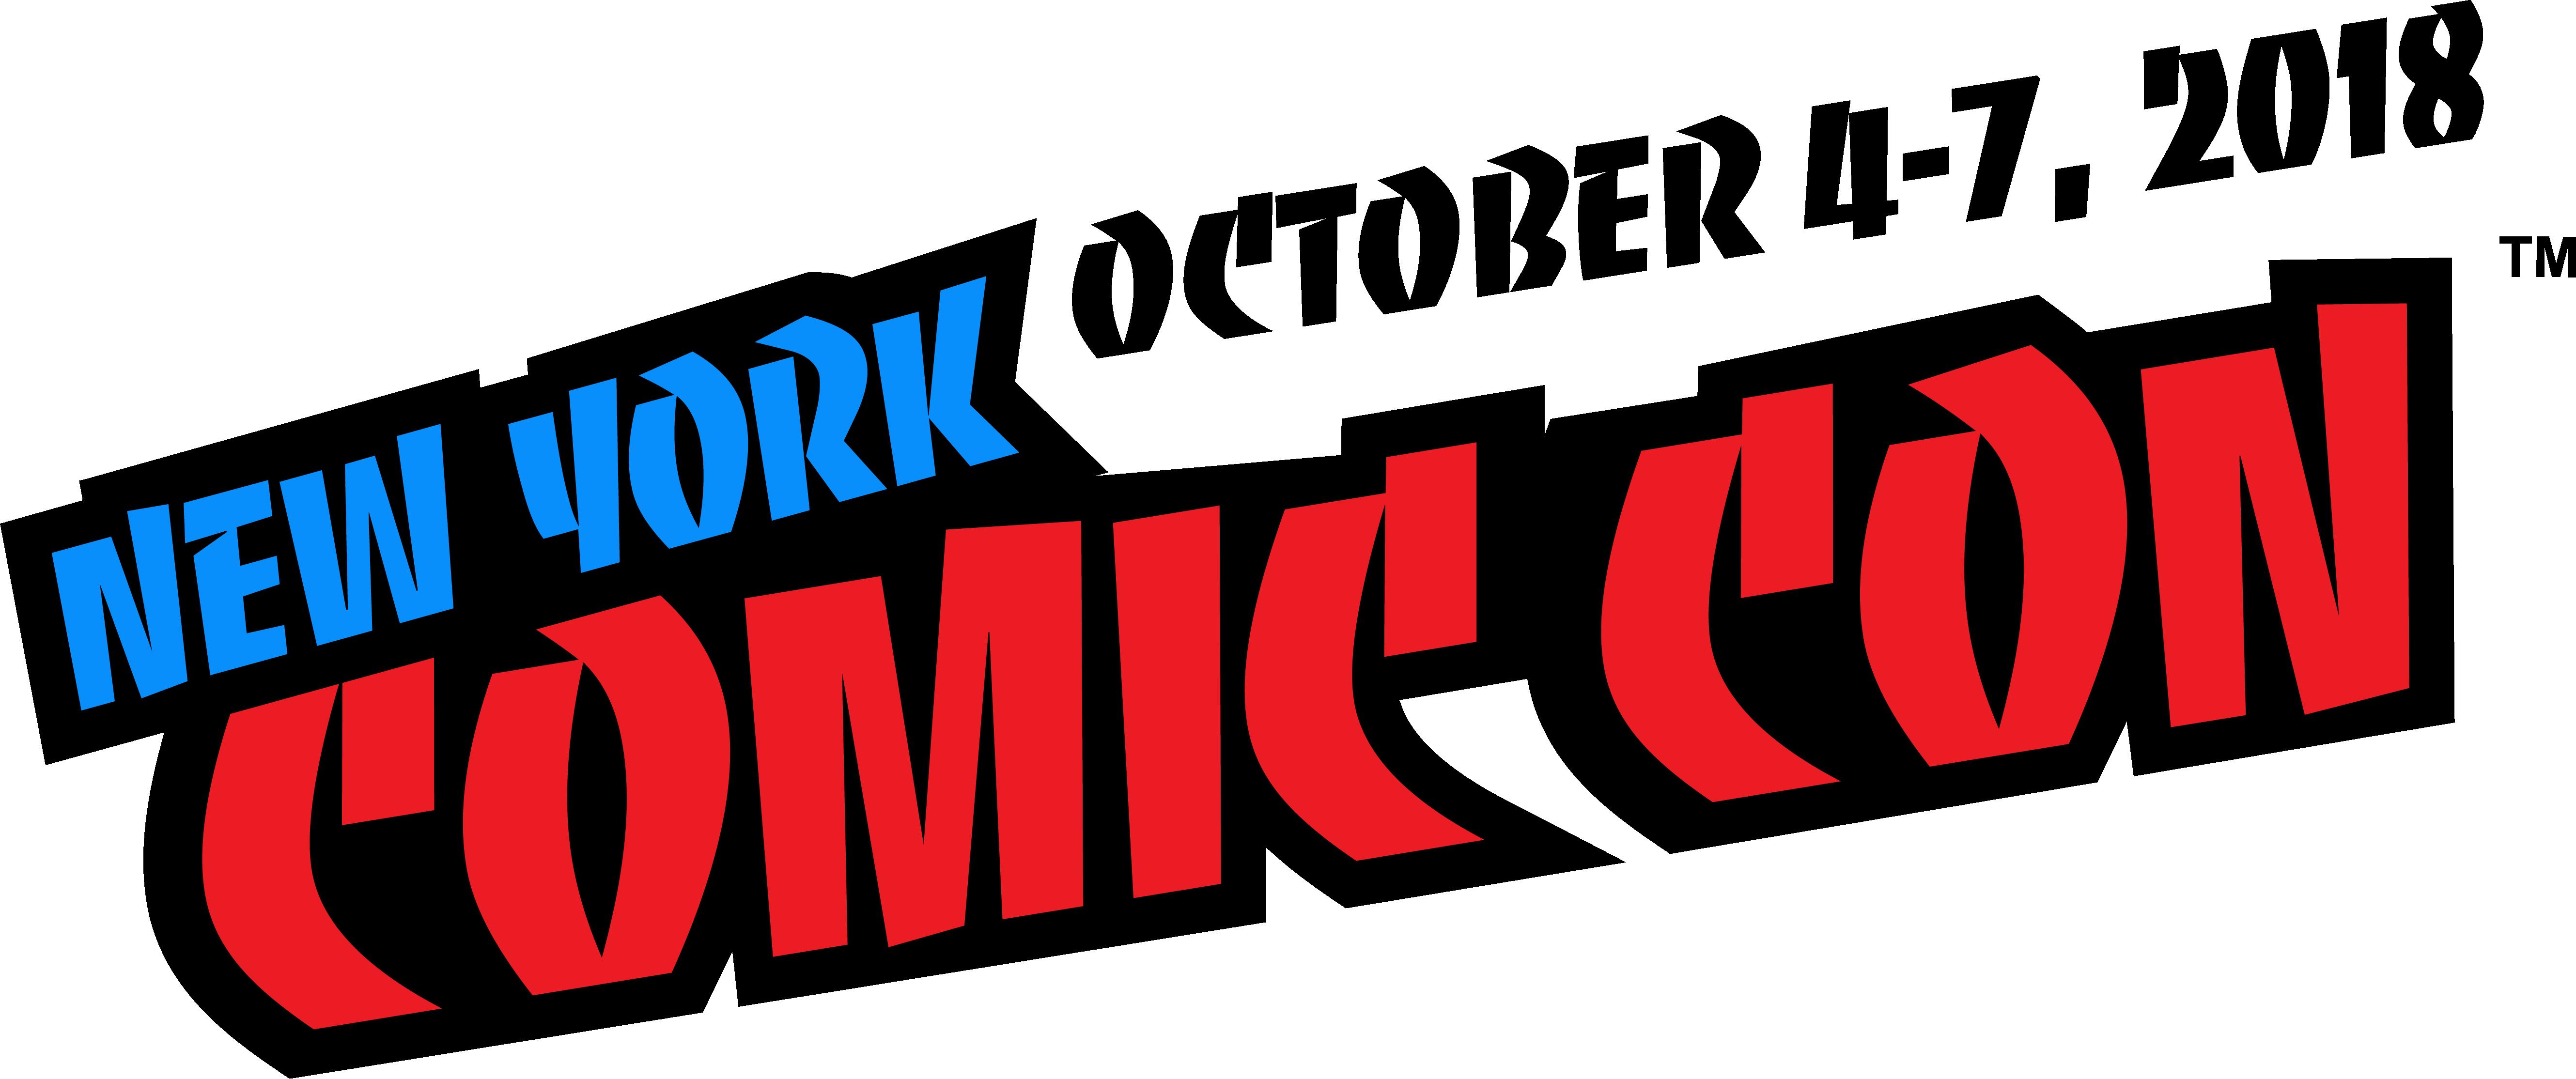 New York Comic Con October 4 - 7